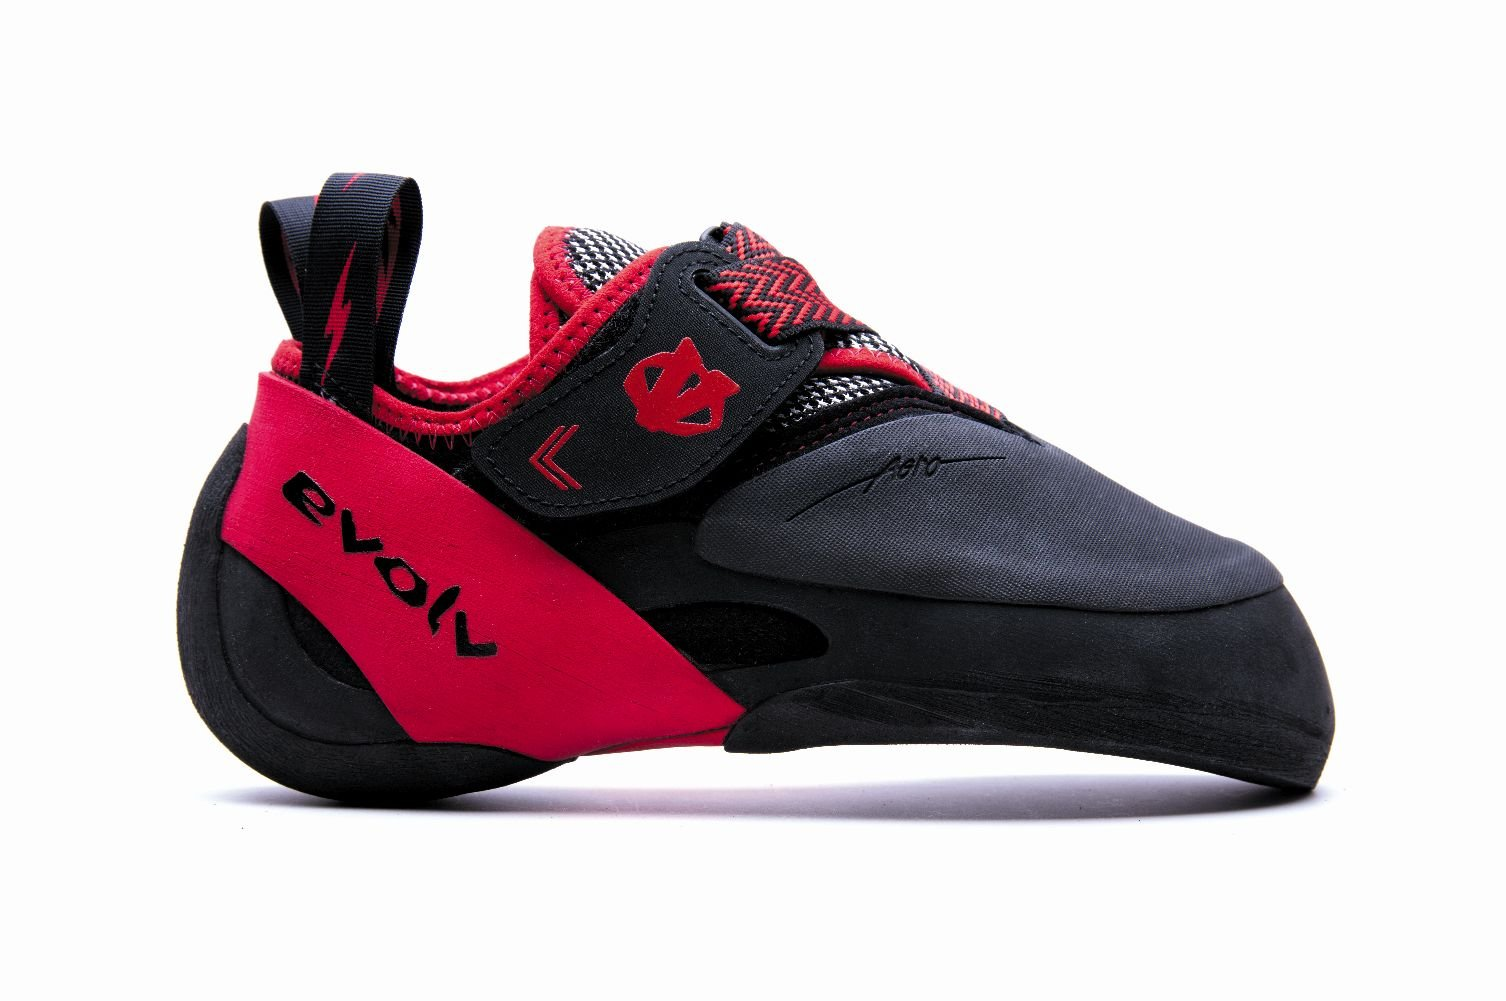 Evolv Agro Climbing Shoe - Black/Red 10.5